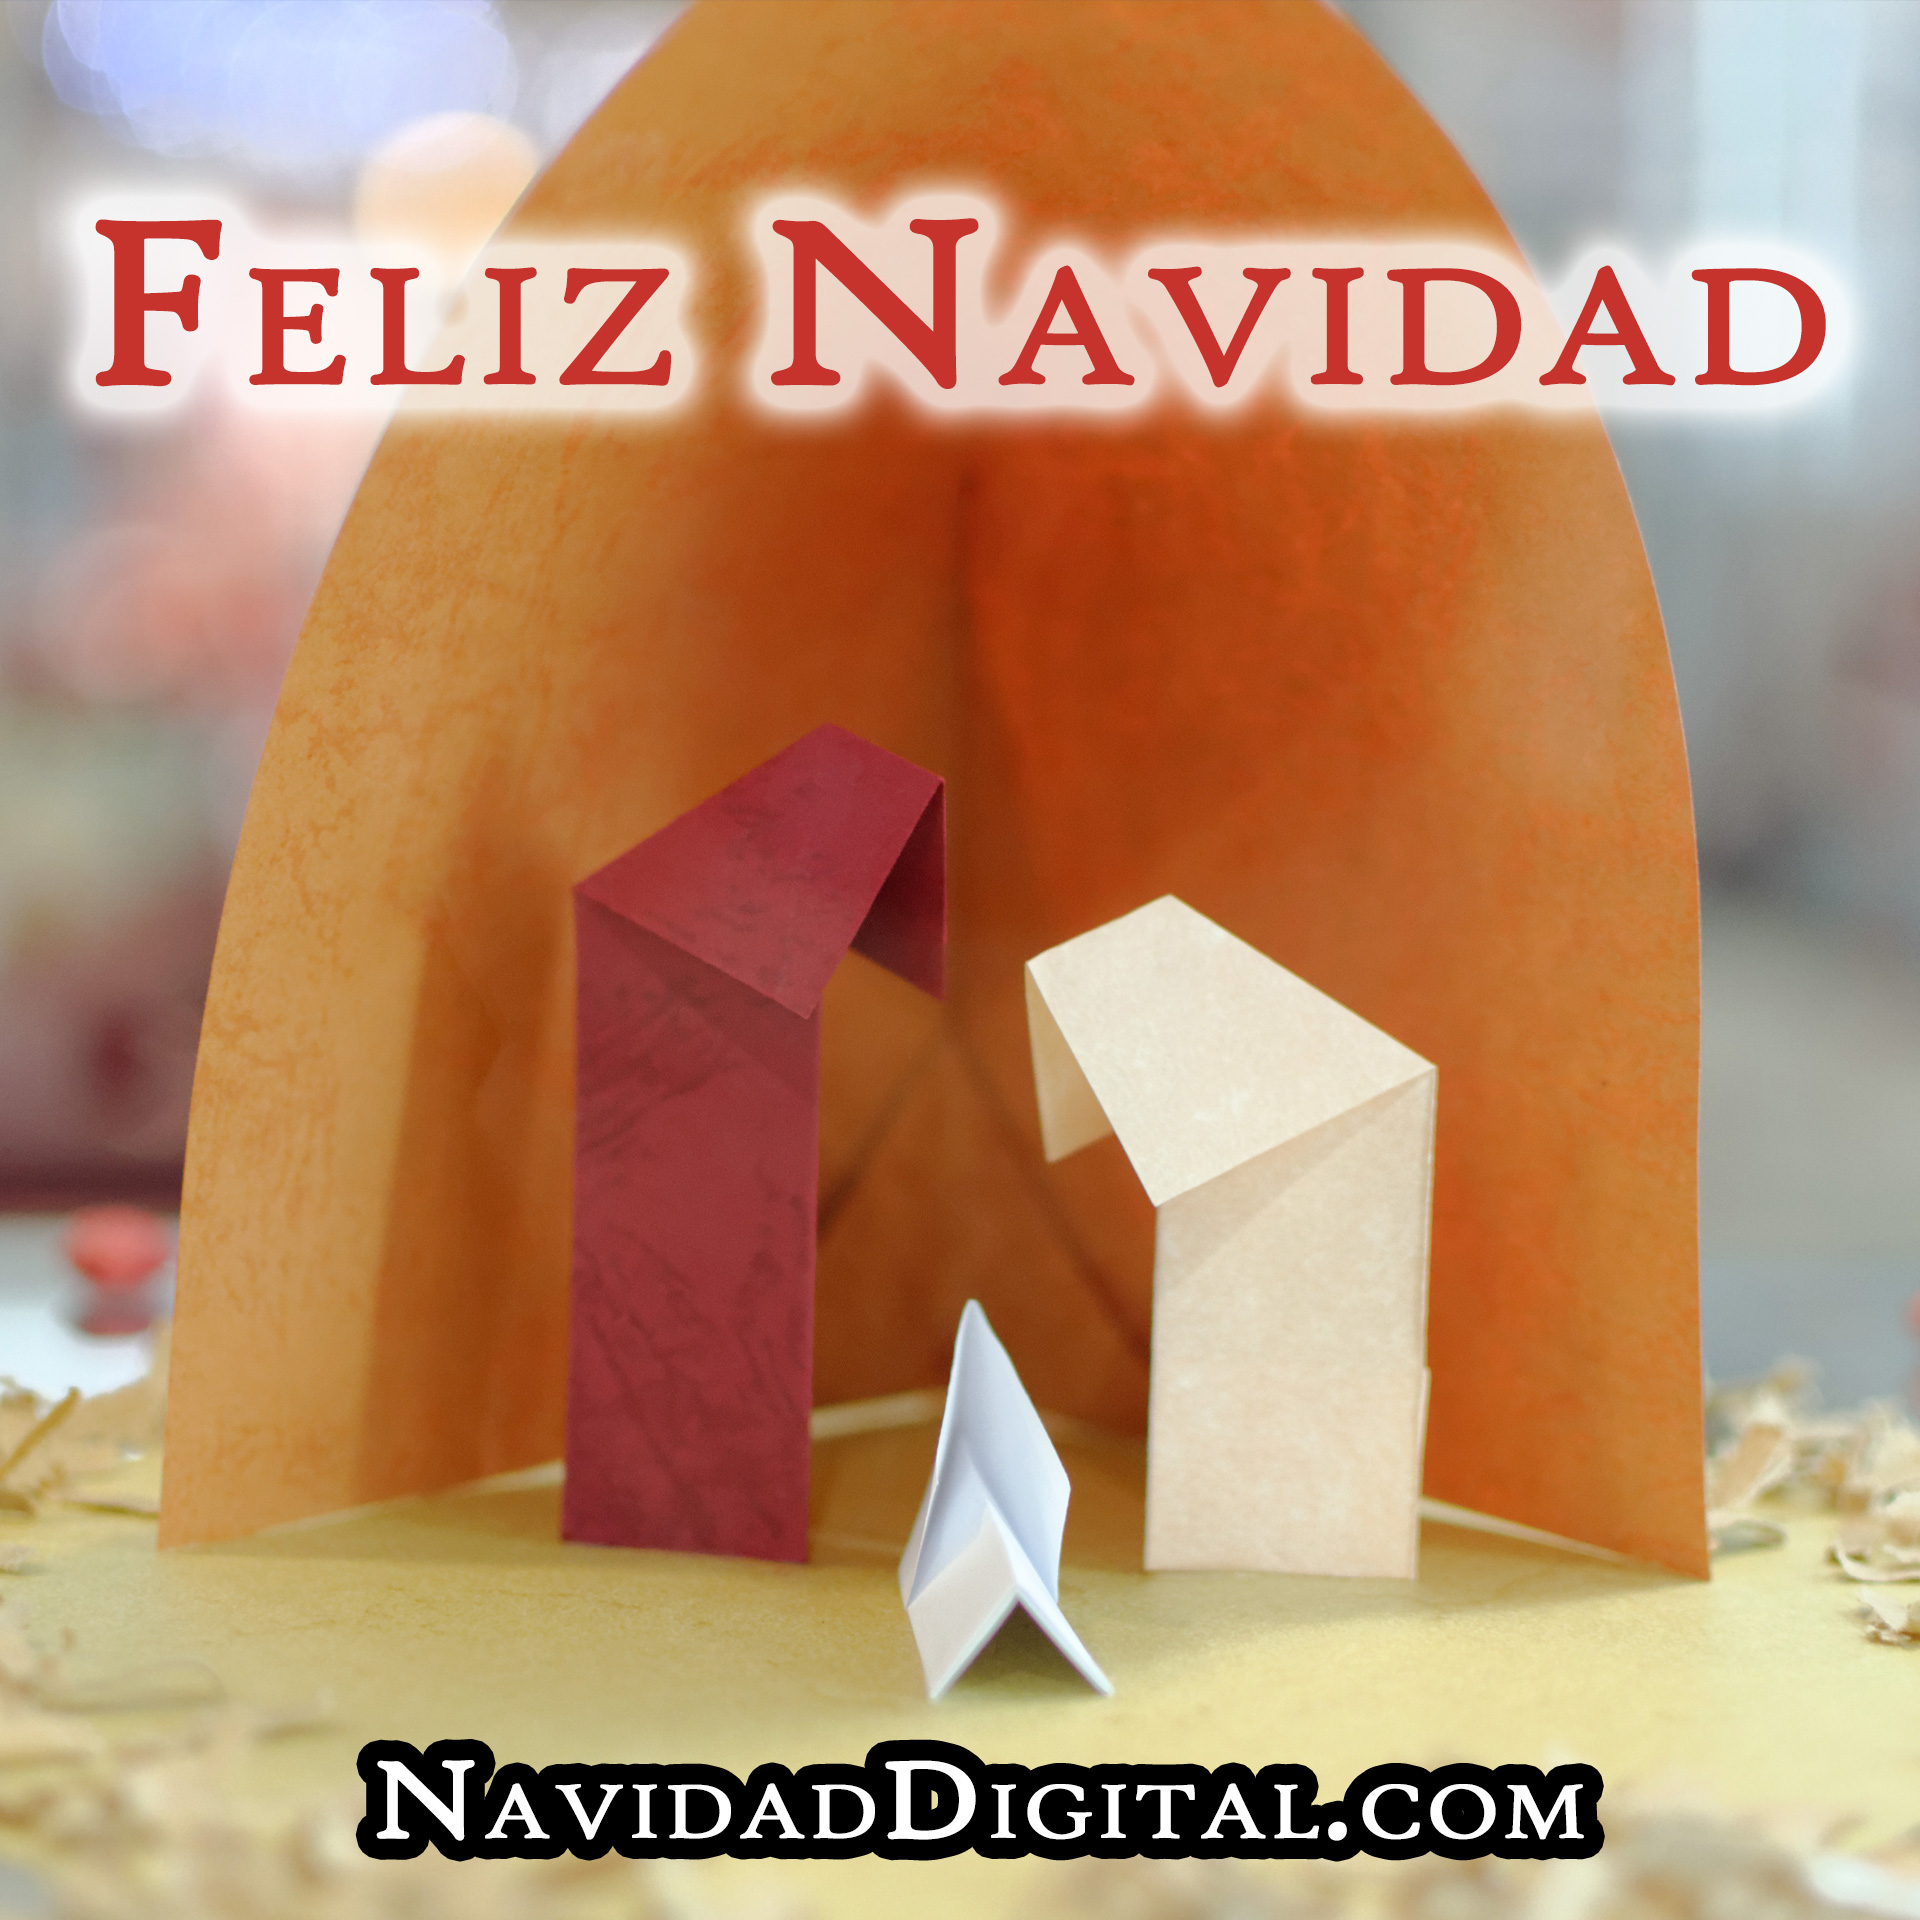 Postales de navidad para enviar el blog de navidad digital - Tarjetas de navidad para enviar ...